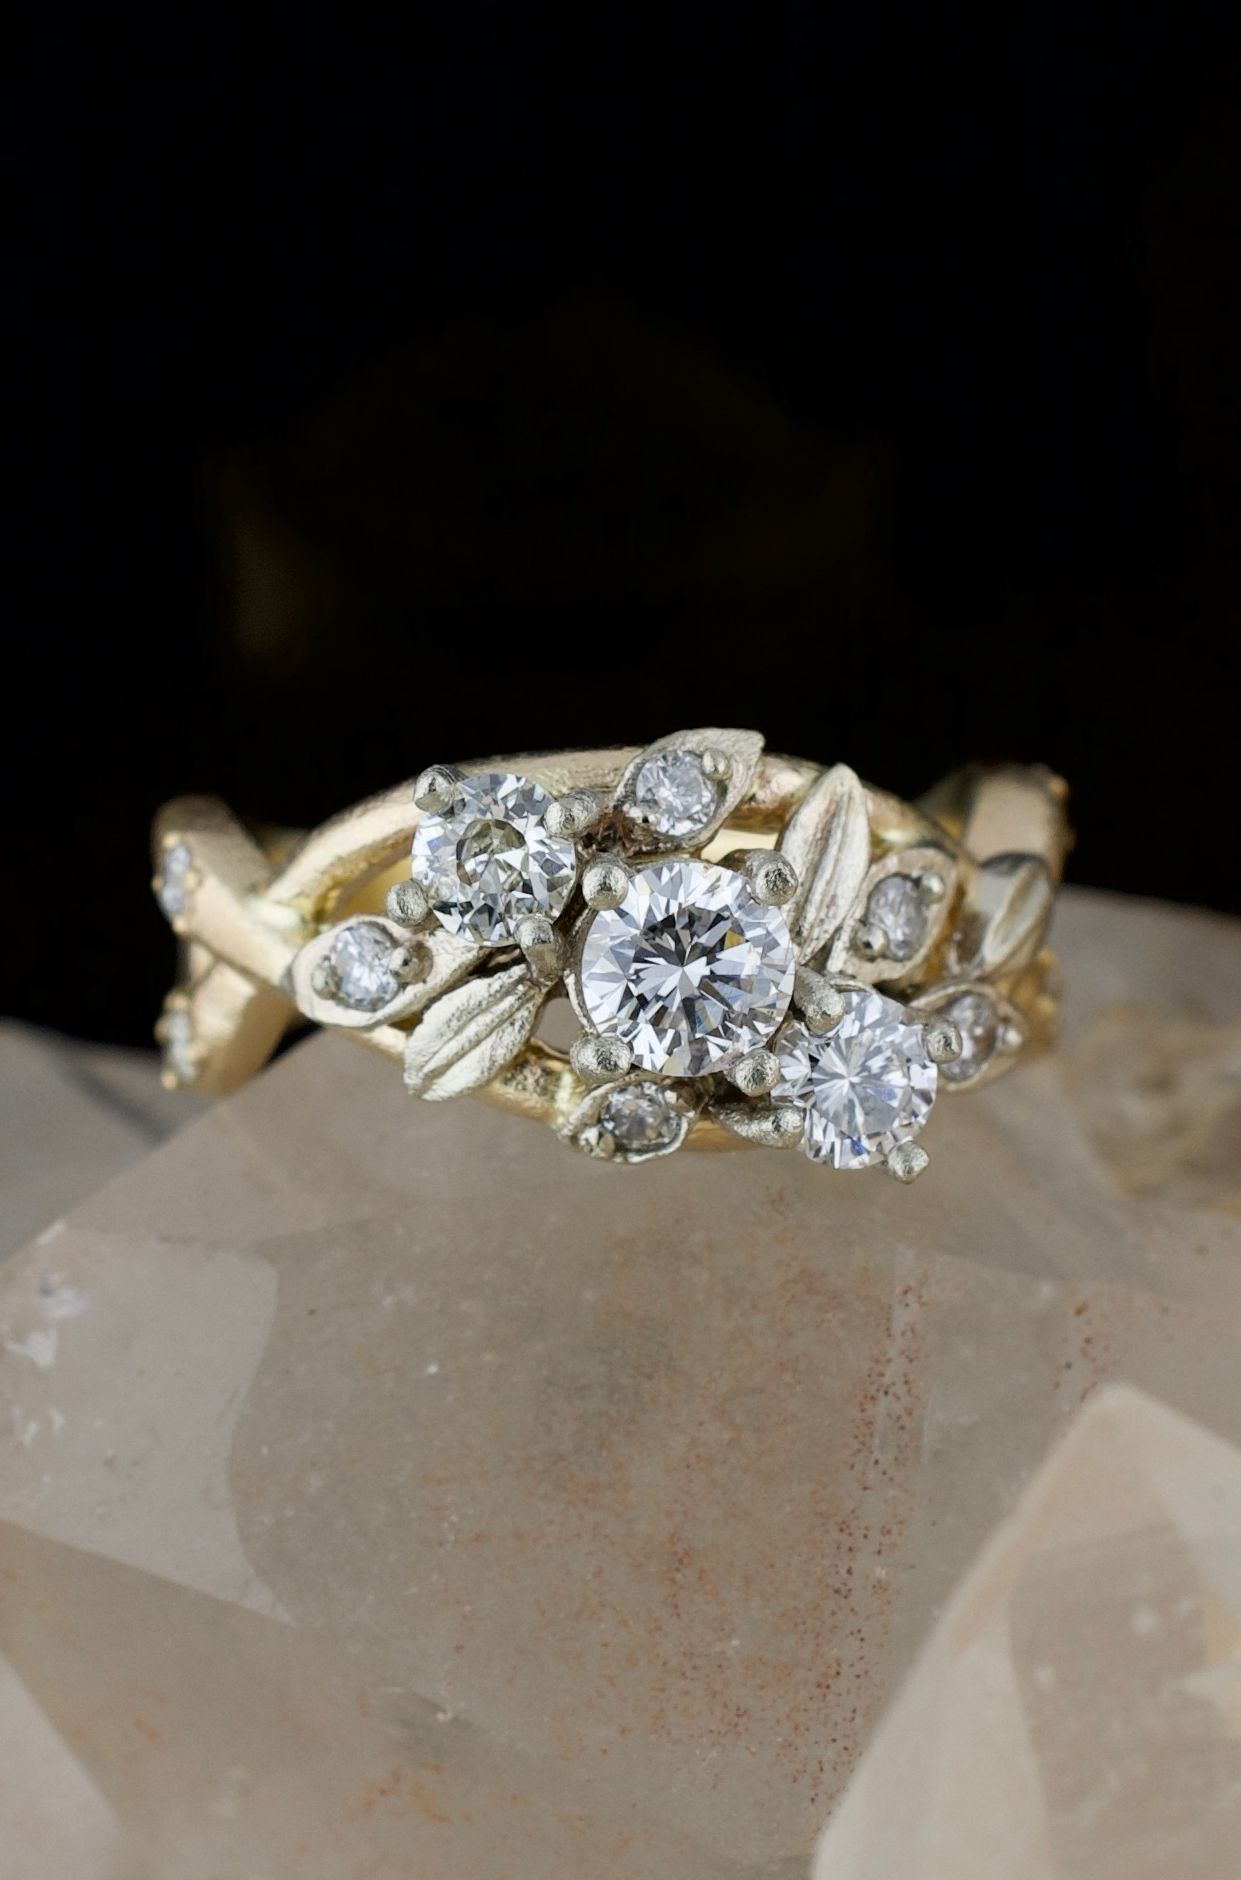 Remodeled Diamond Ring Old Jewelry Rings Baguette Diamond Rings